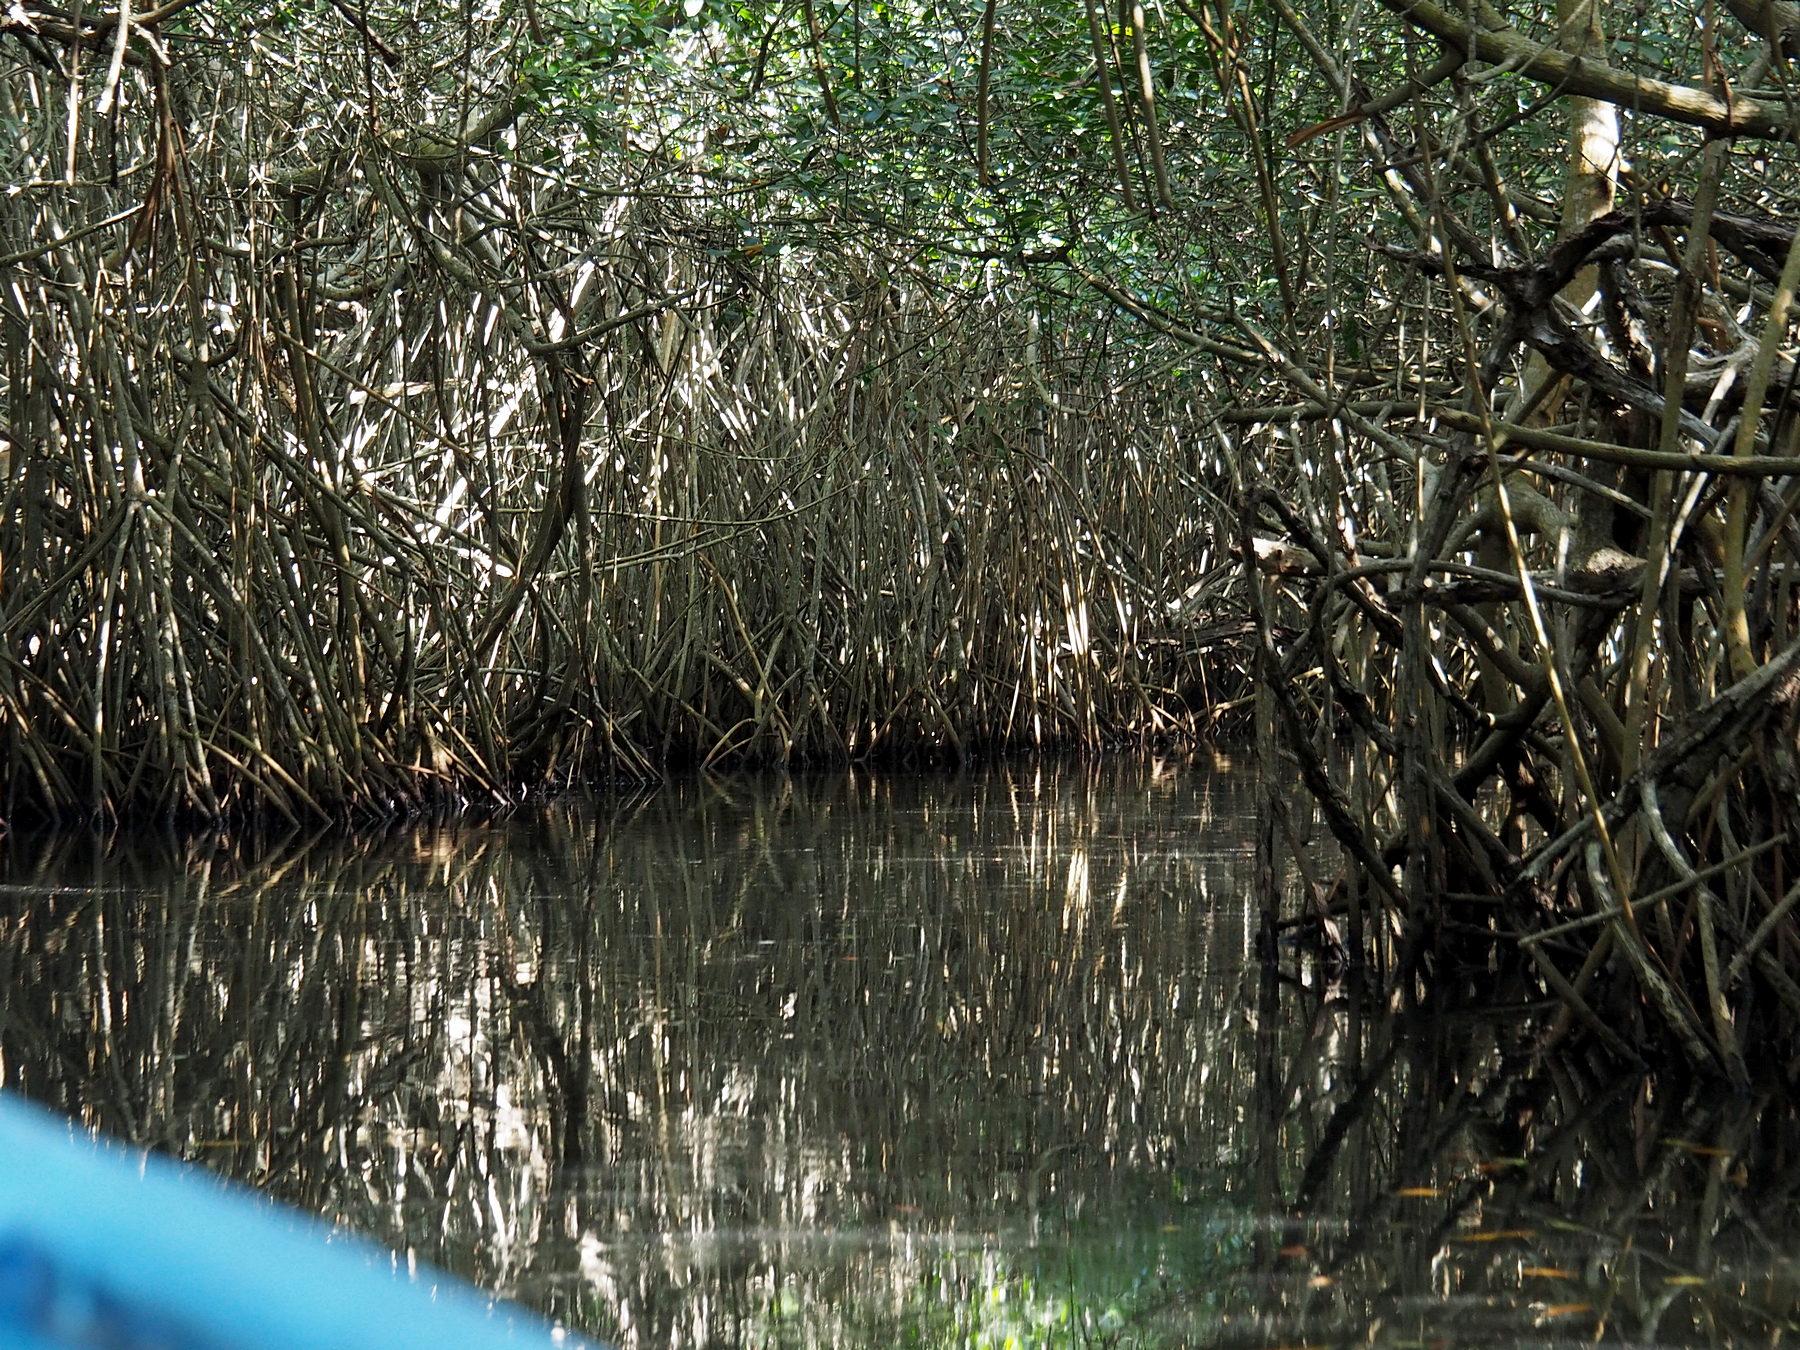 Anfangs geht es durch dichte Mangroven